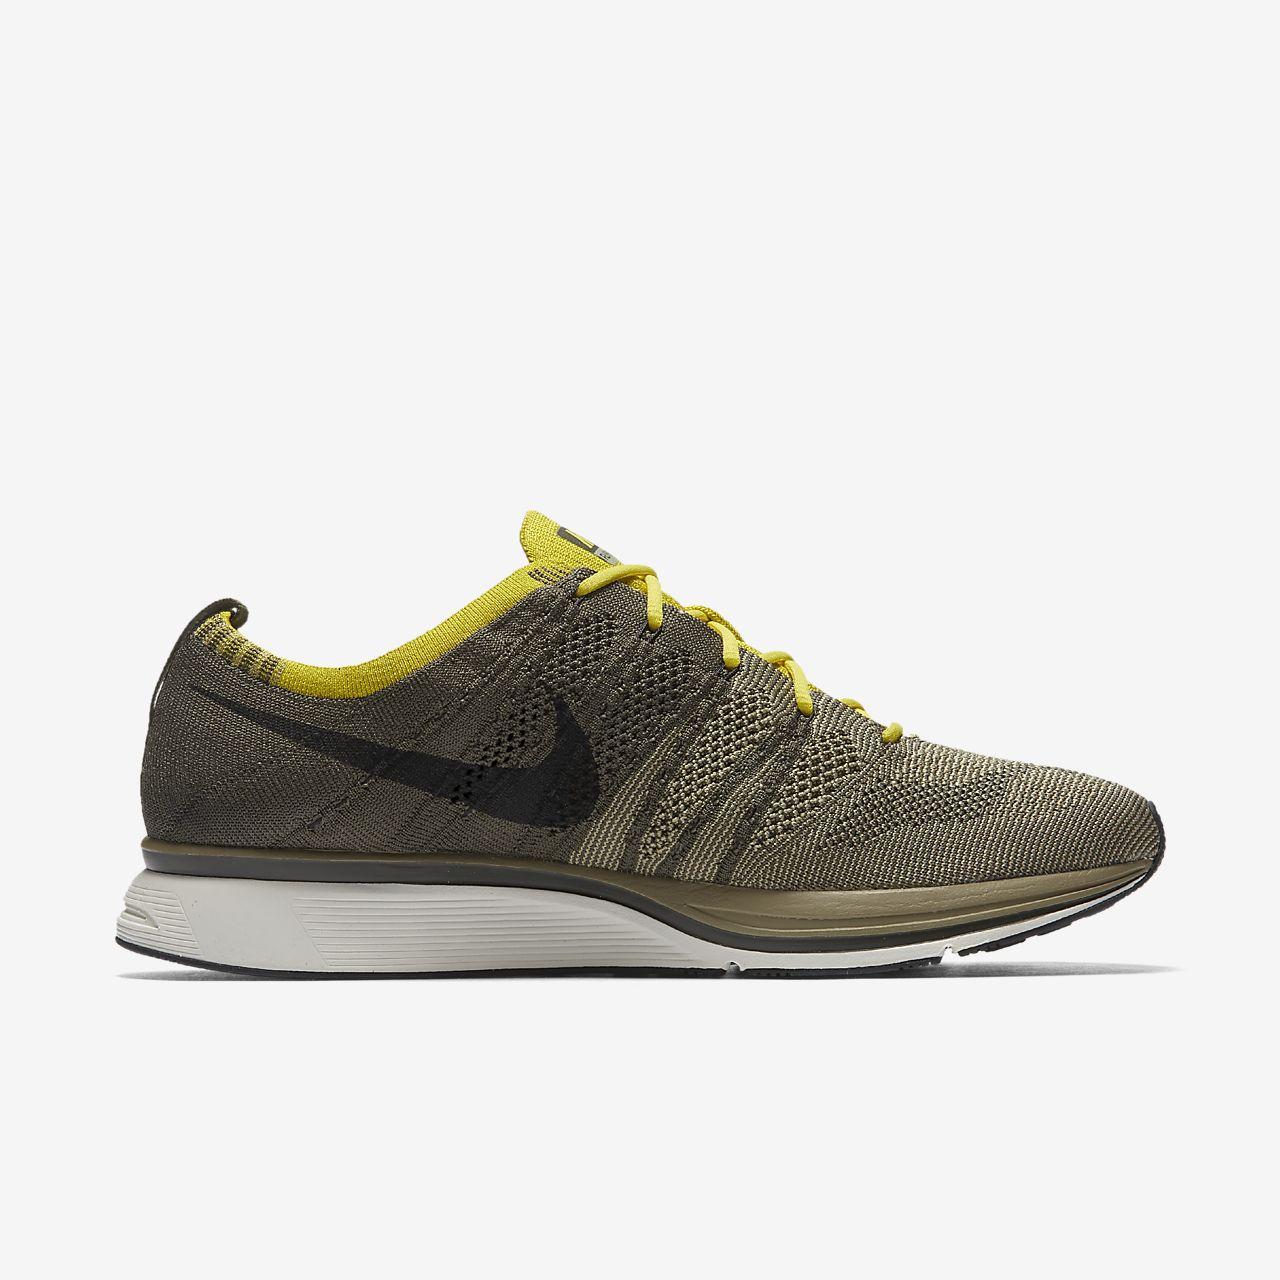 549e7c30f4cad Nike Flyknit Trainer Unisex Shoe. Nike.com CA